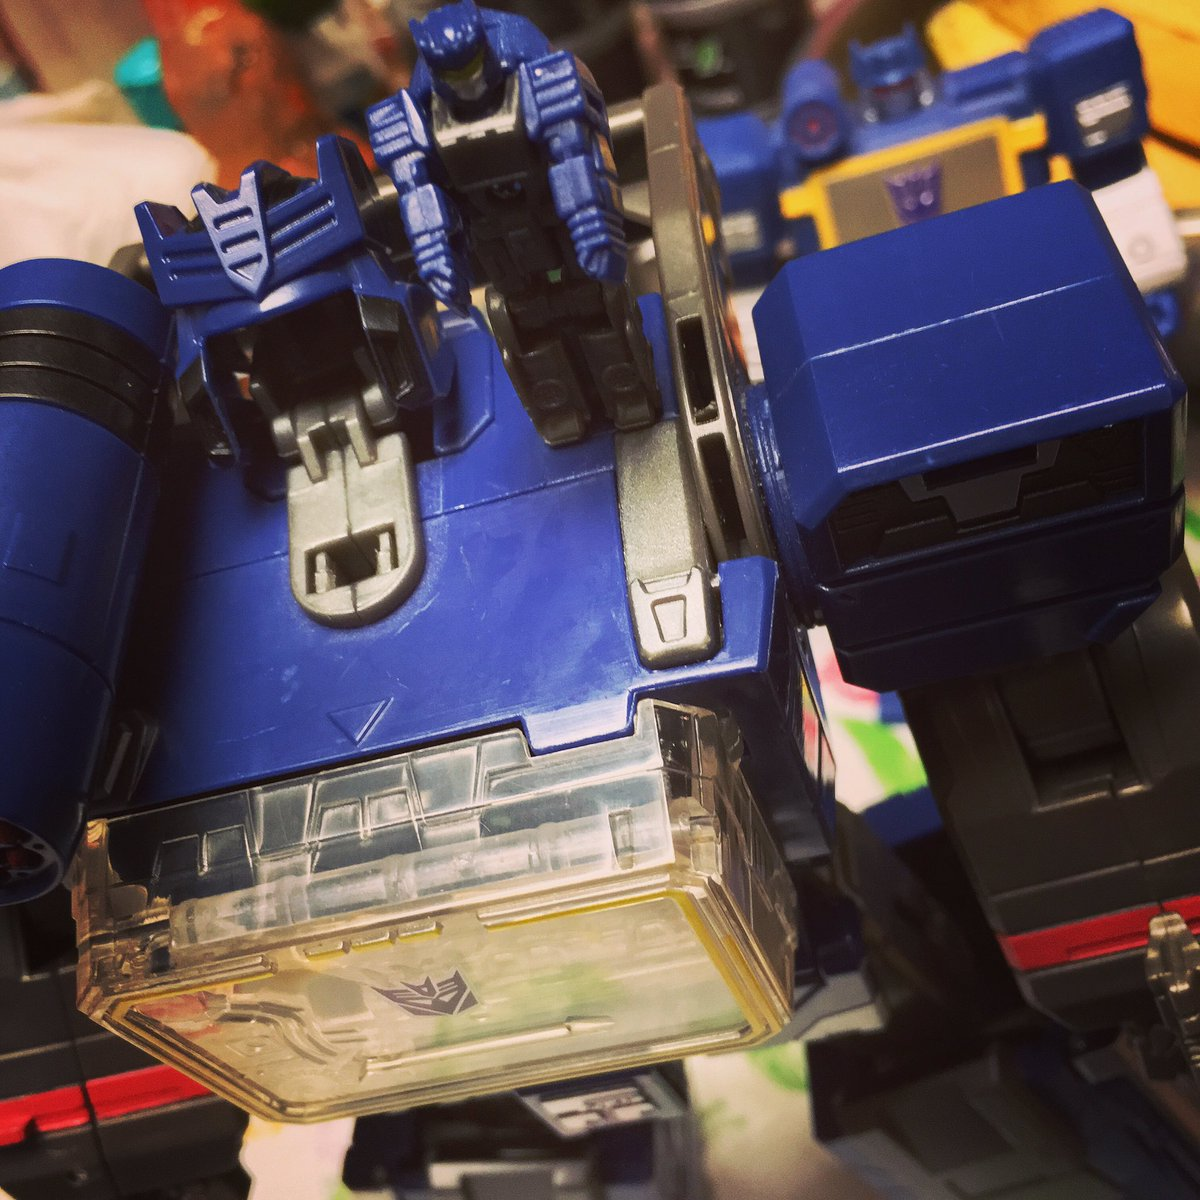 Face off! #soundwave #doombox #transformers #decepticon